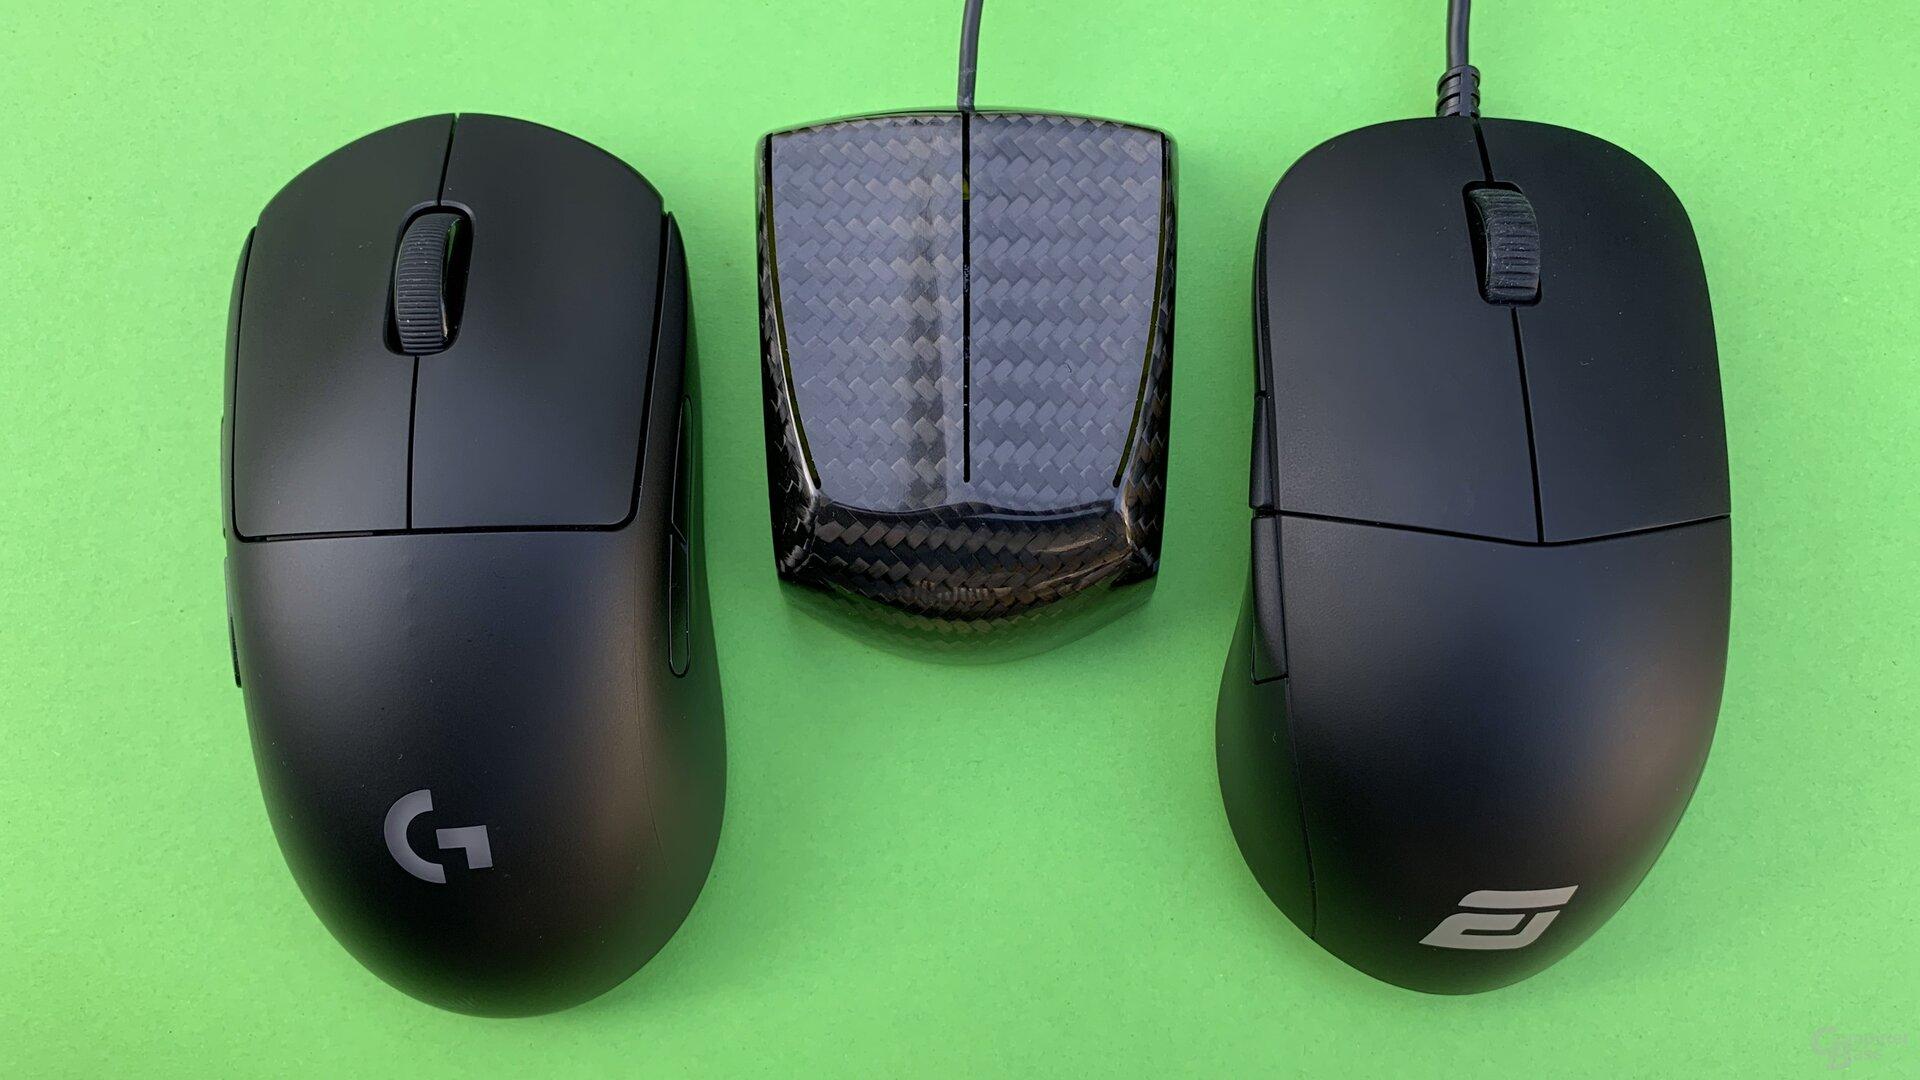 Logitech G Pro Wireless, Zaunkoenig M1K & Endgame Gear XM1